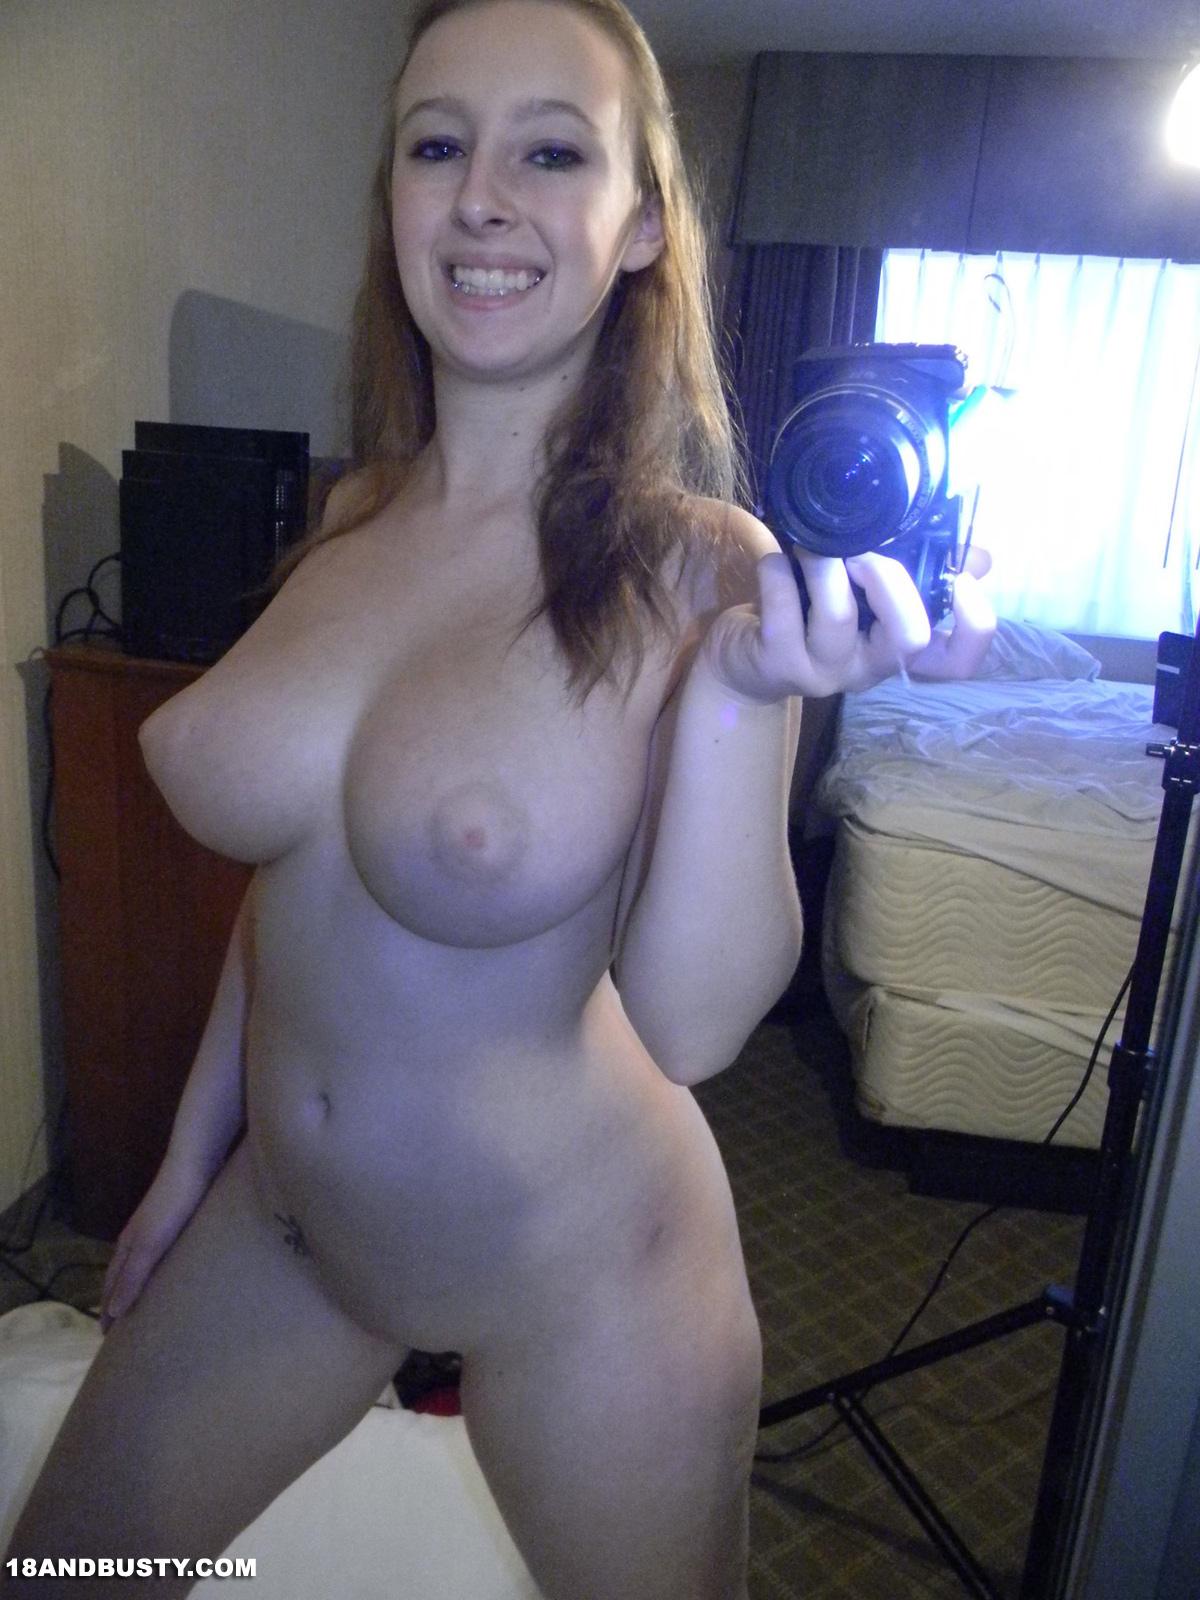 imagenes de ozawa maria teniendo sexo